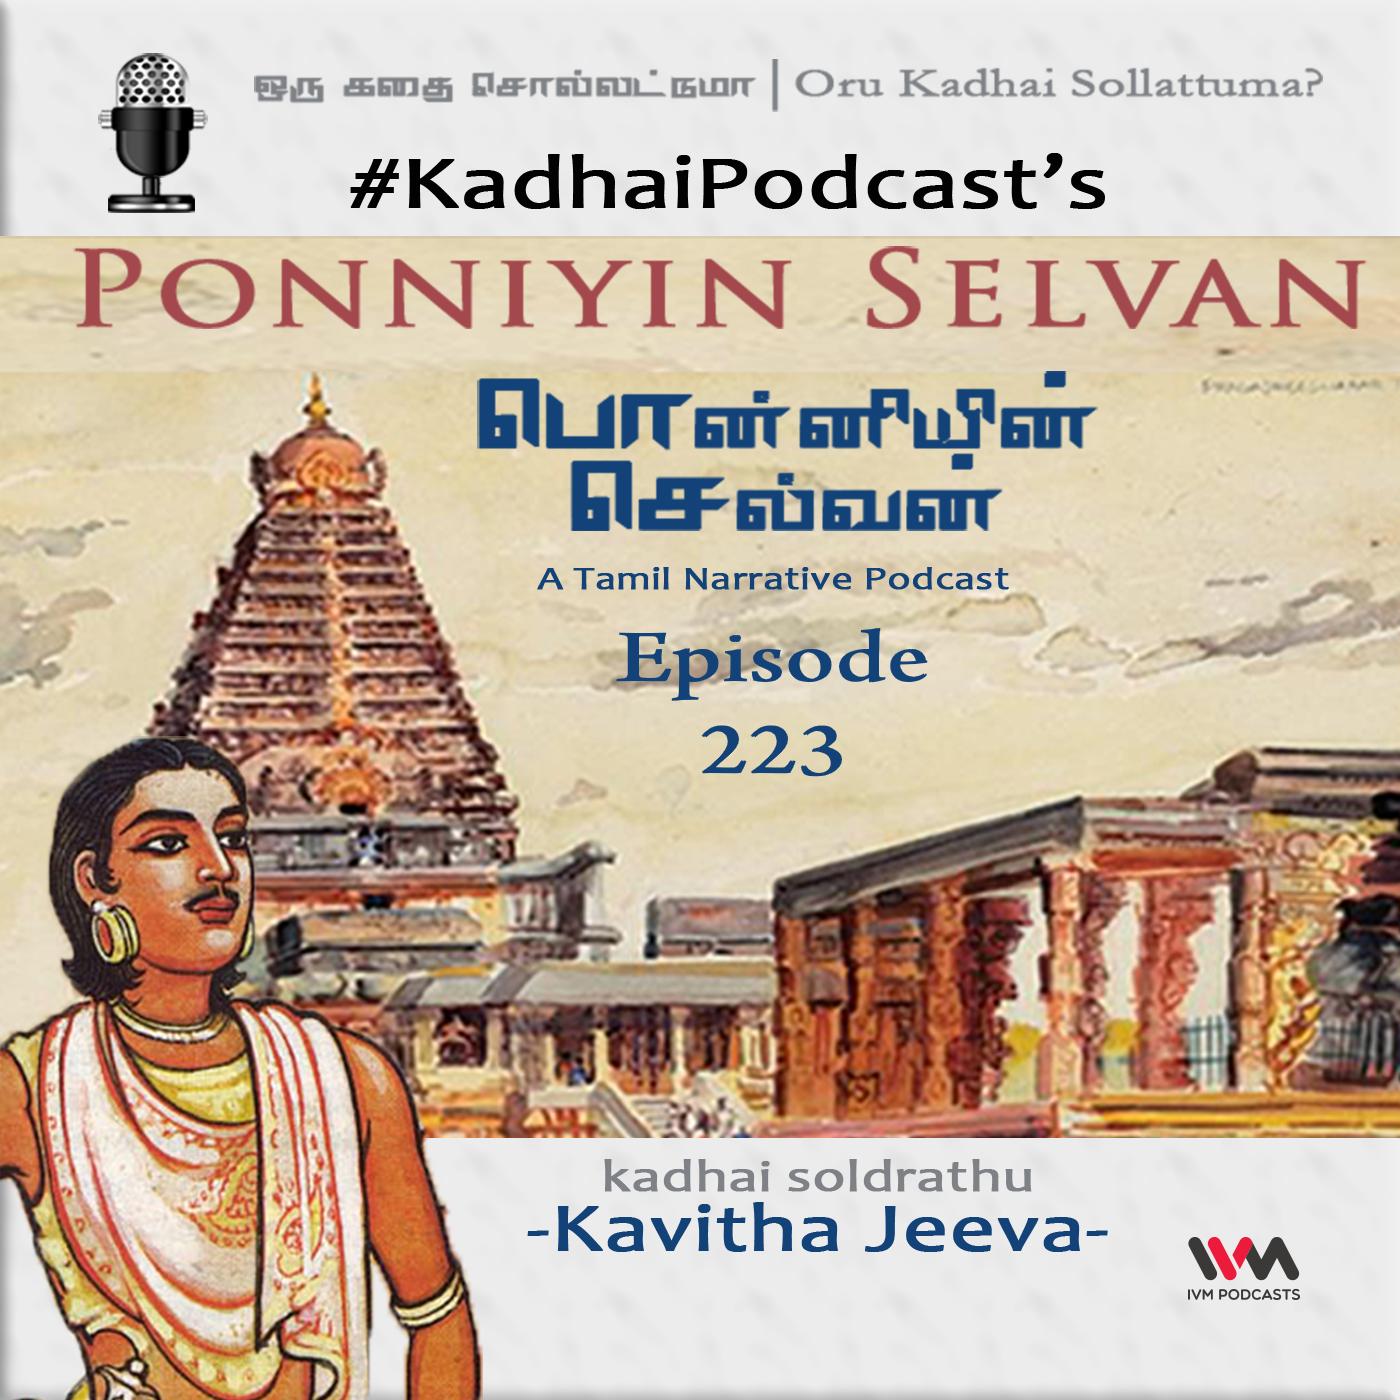 KadhaiPodcast's Ponniyin Selvan - Episode # 223